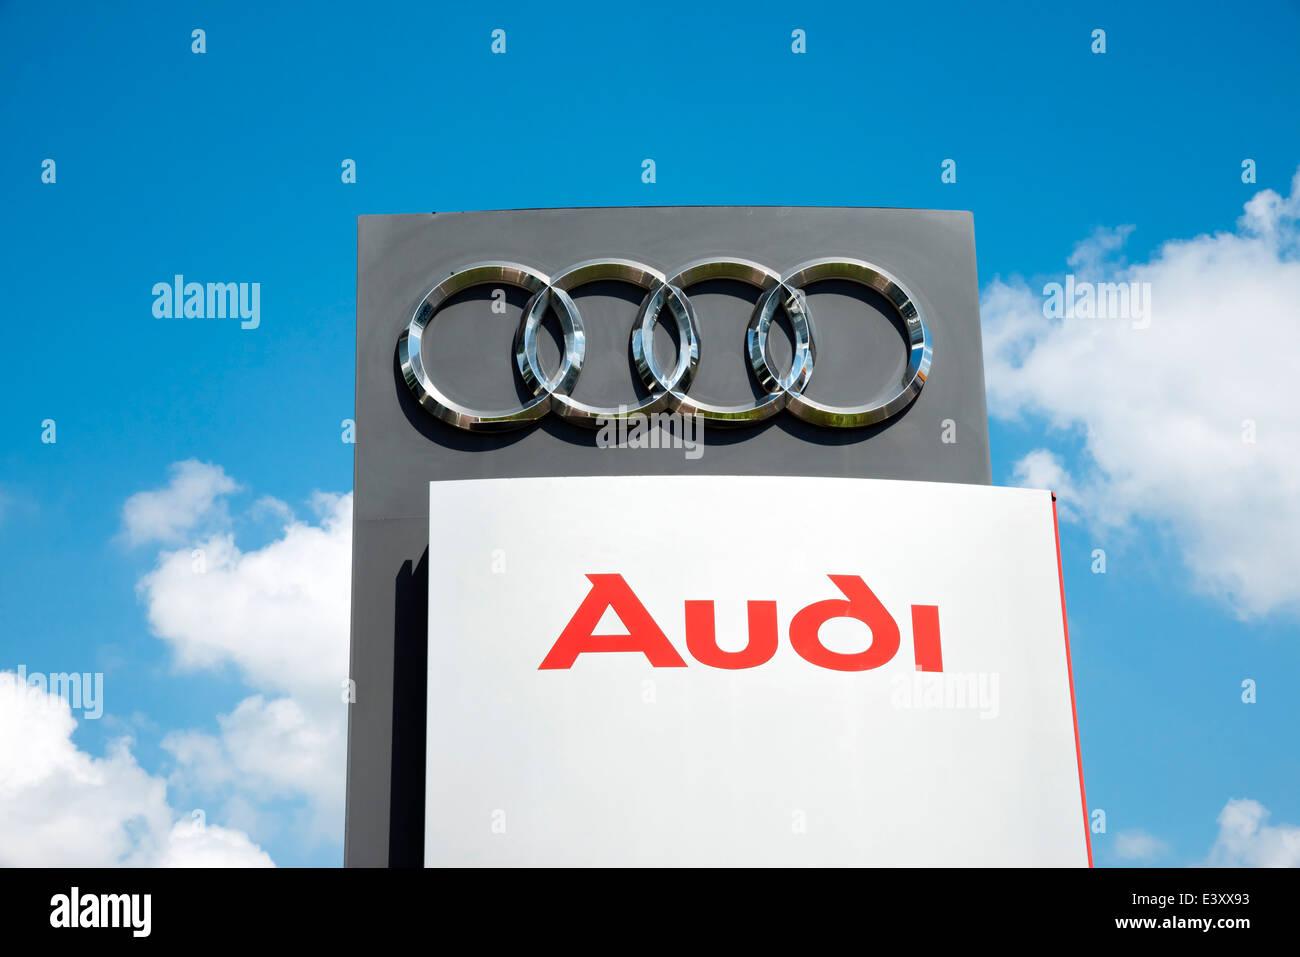 Concessionnaire automobile Audi signe, UK. Photo Stock